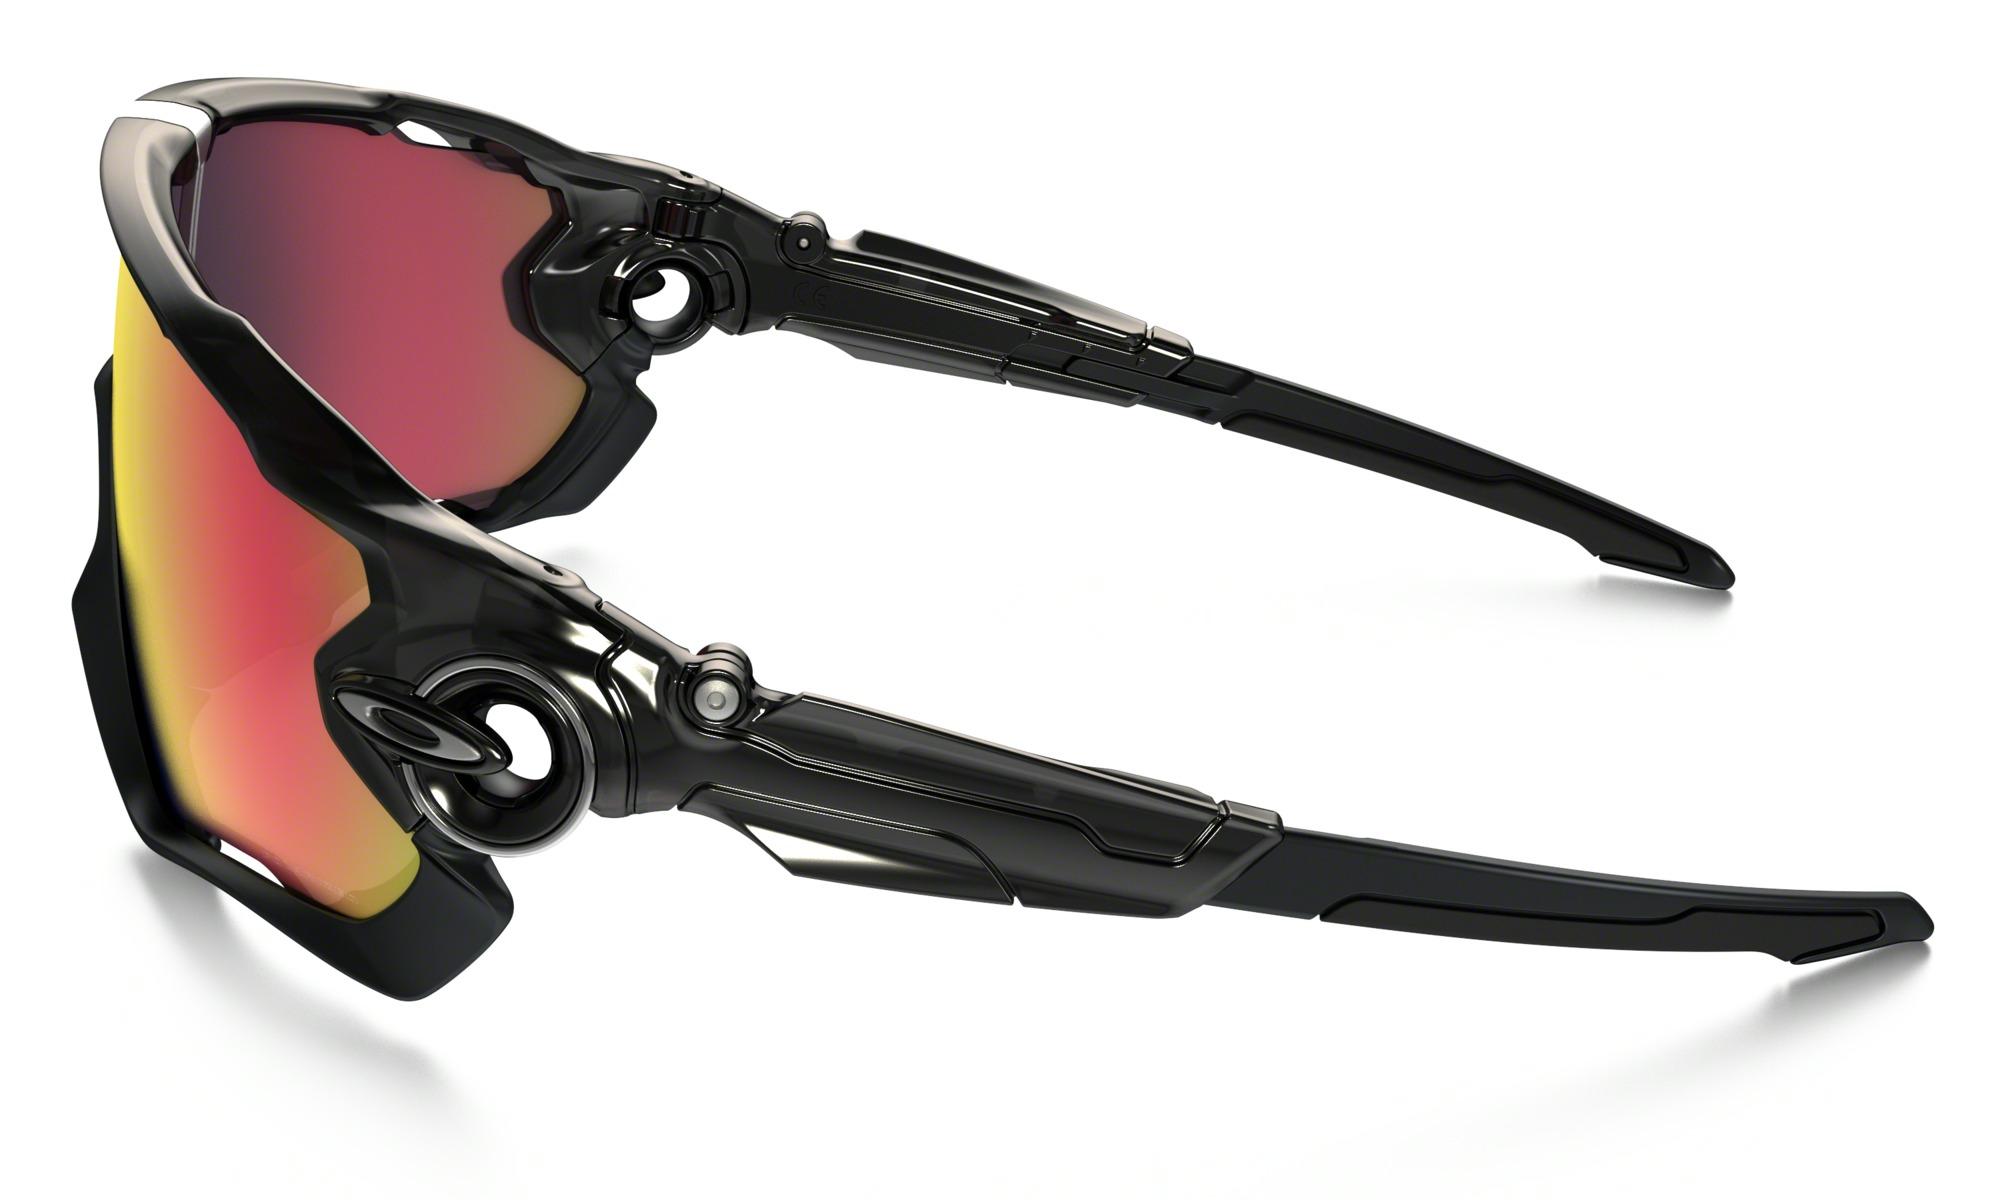 8994e6c330f3c JAWBREAKER BLACK INC   RED IRIDIUM POLARIZED - Bells Cycling